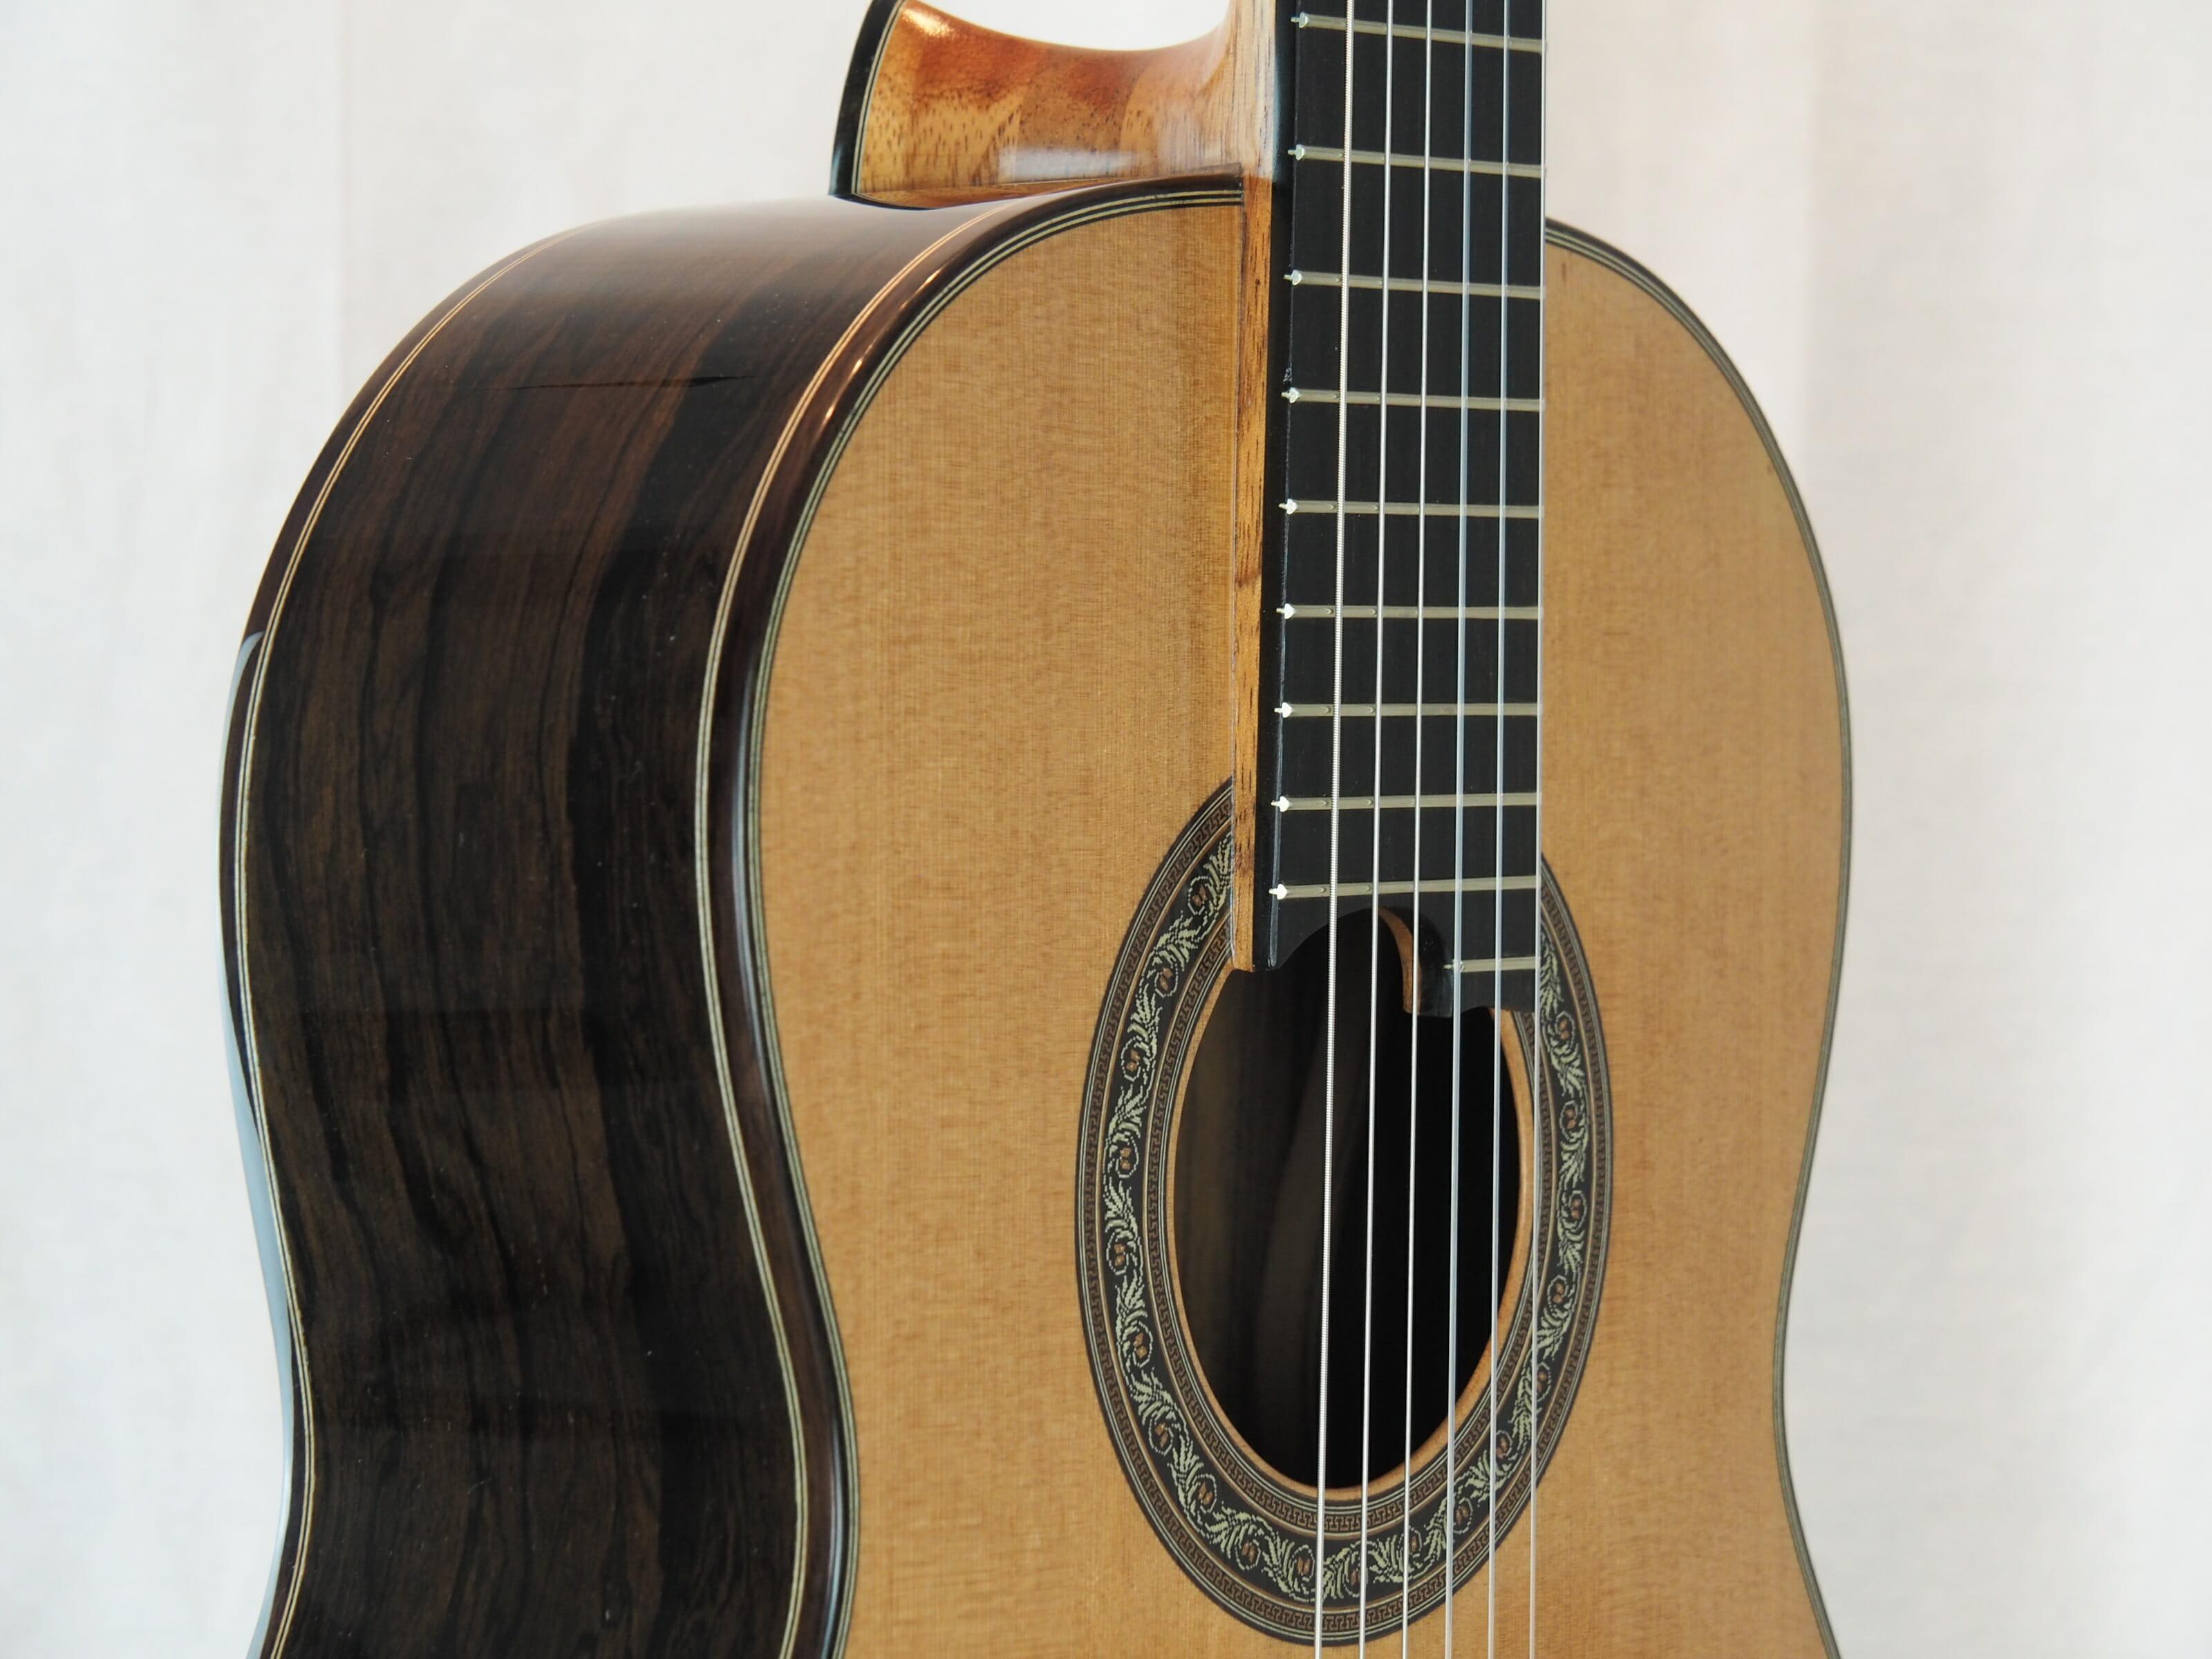 Charalampos Koumridis luthier www.guitare-classique-concert.fr No 138 19KOU138-04